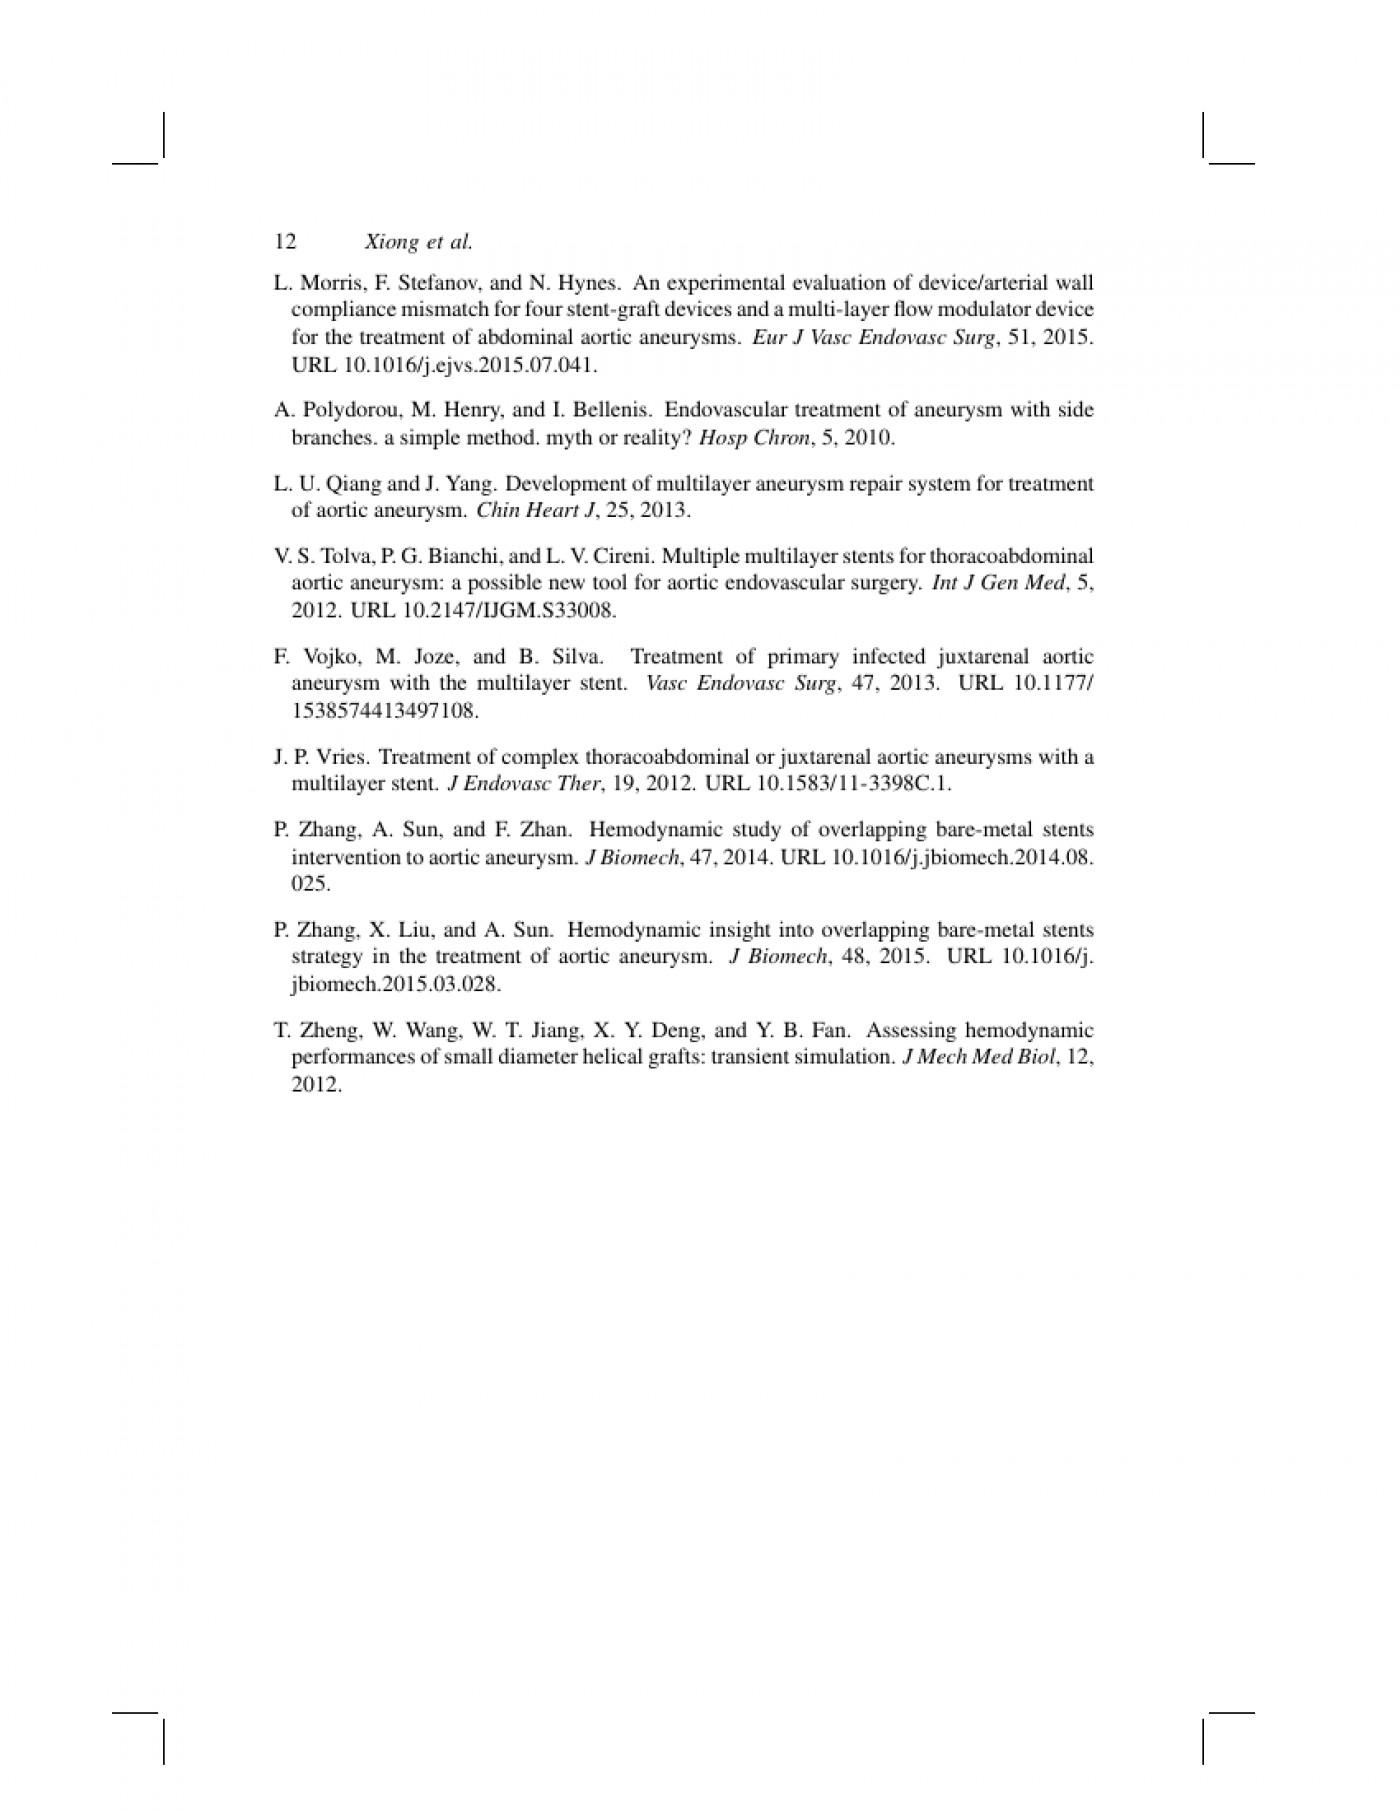 018 Toefl Ibt Essay Topics Output Striking 2015 1400